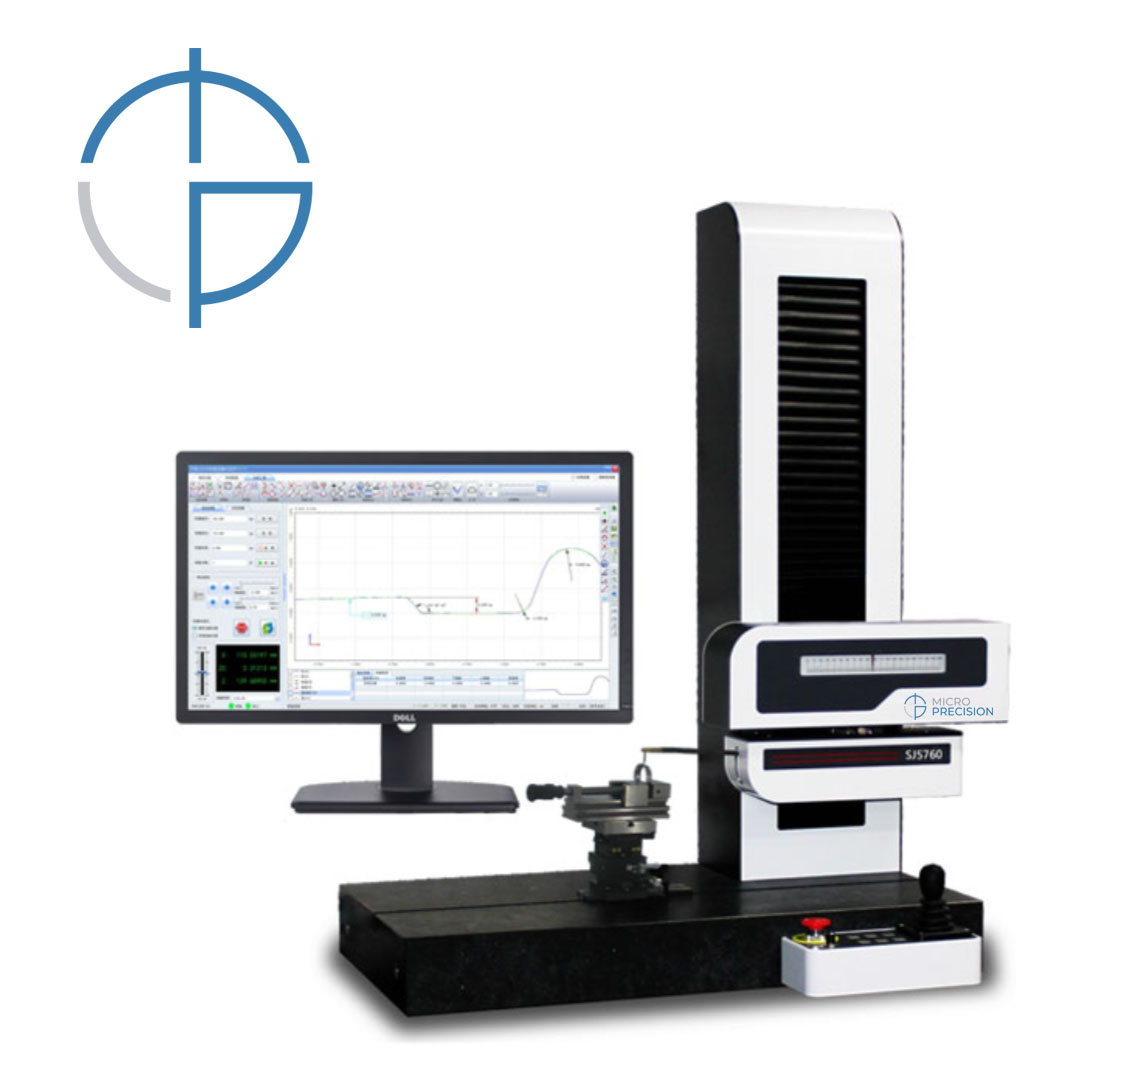 Micro Precision MP5760 Contour And Roughness | 2D Profilometer | Contour measuring machine